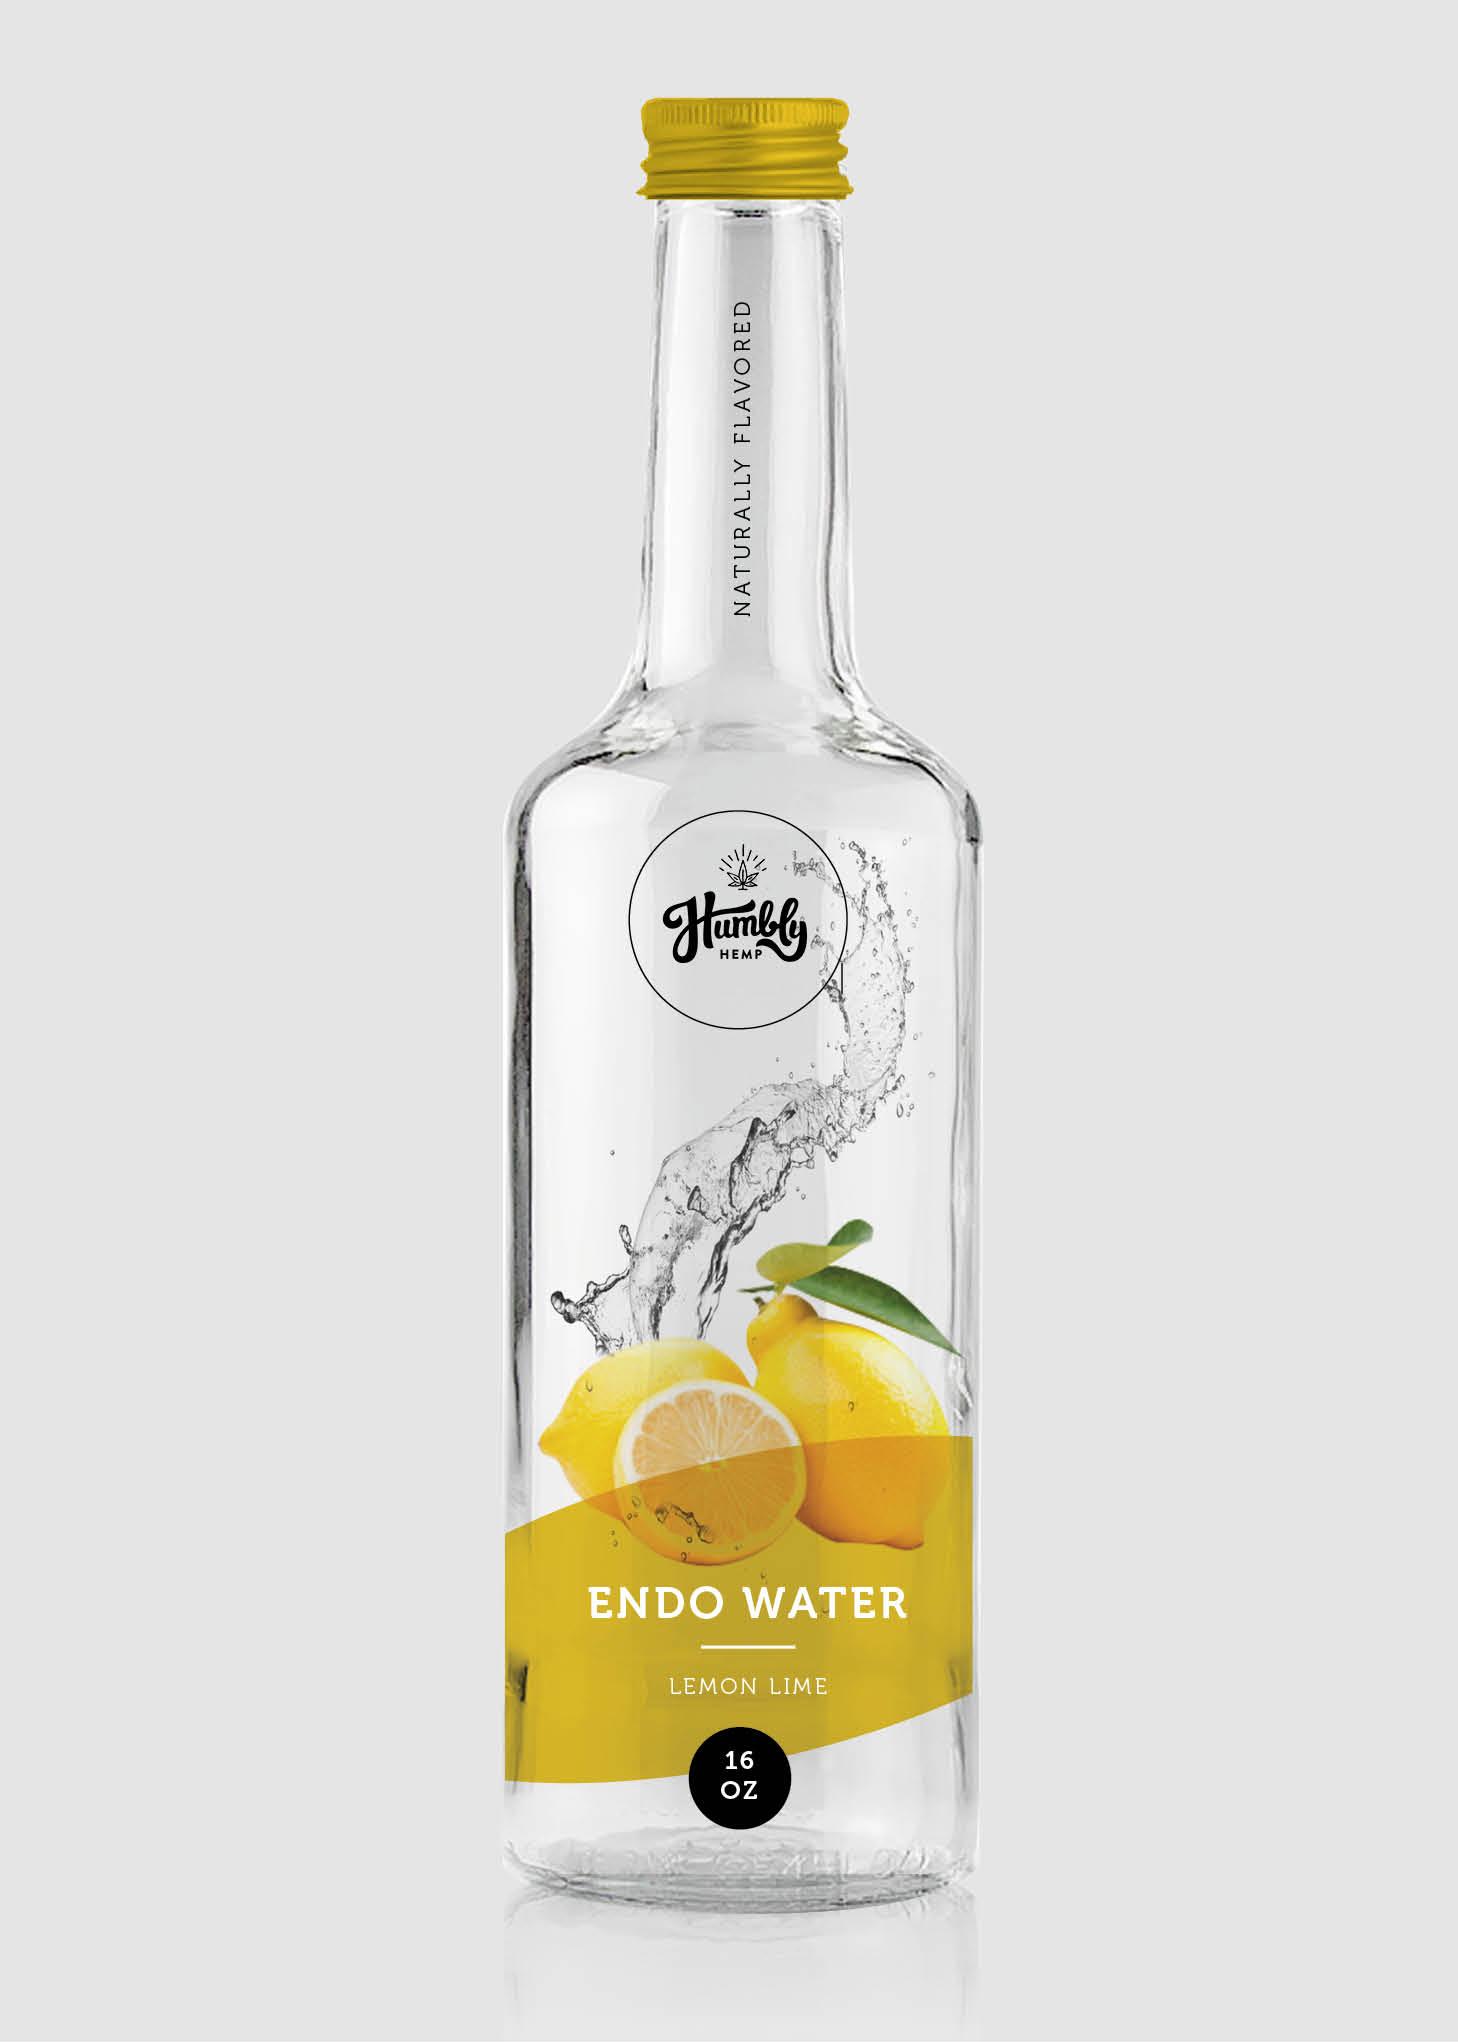 Endo Water